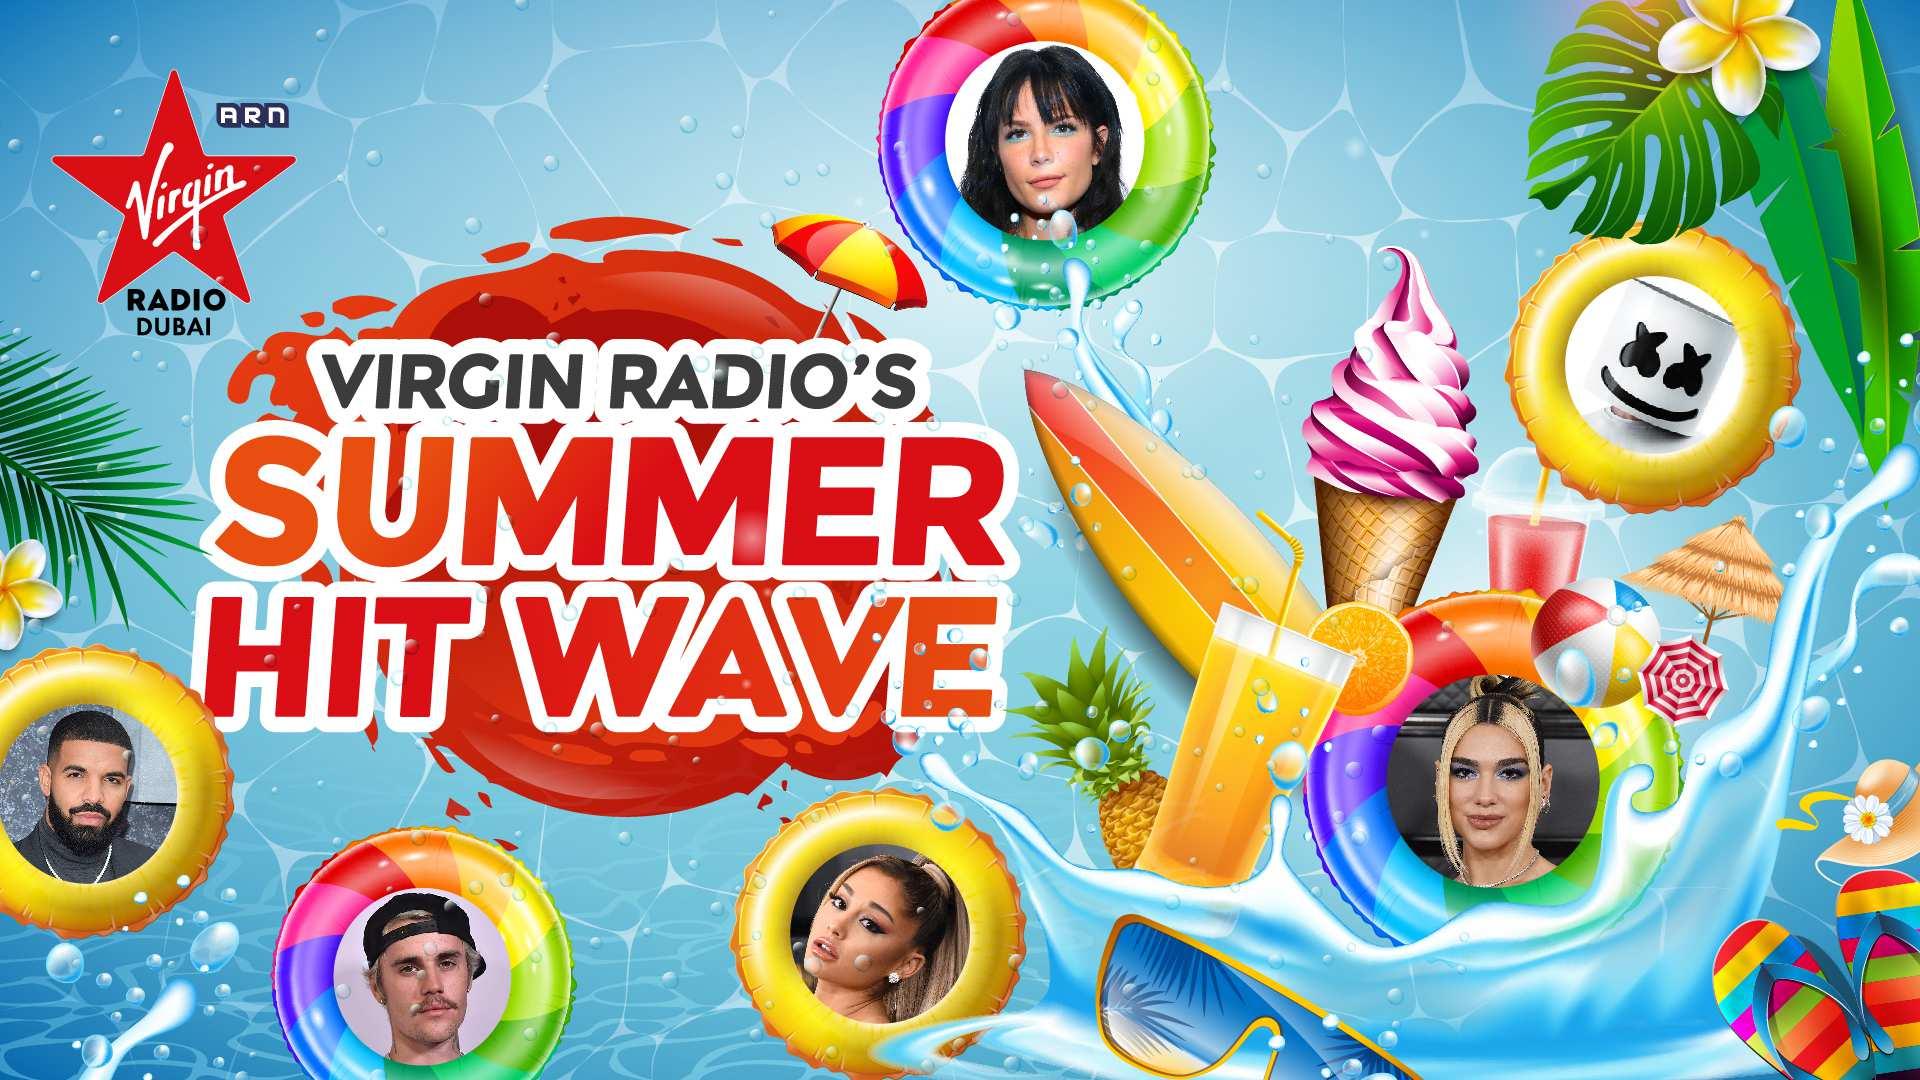 Virgin Radio's Summer Hit Wave 2020